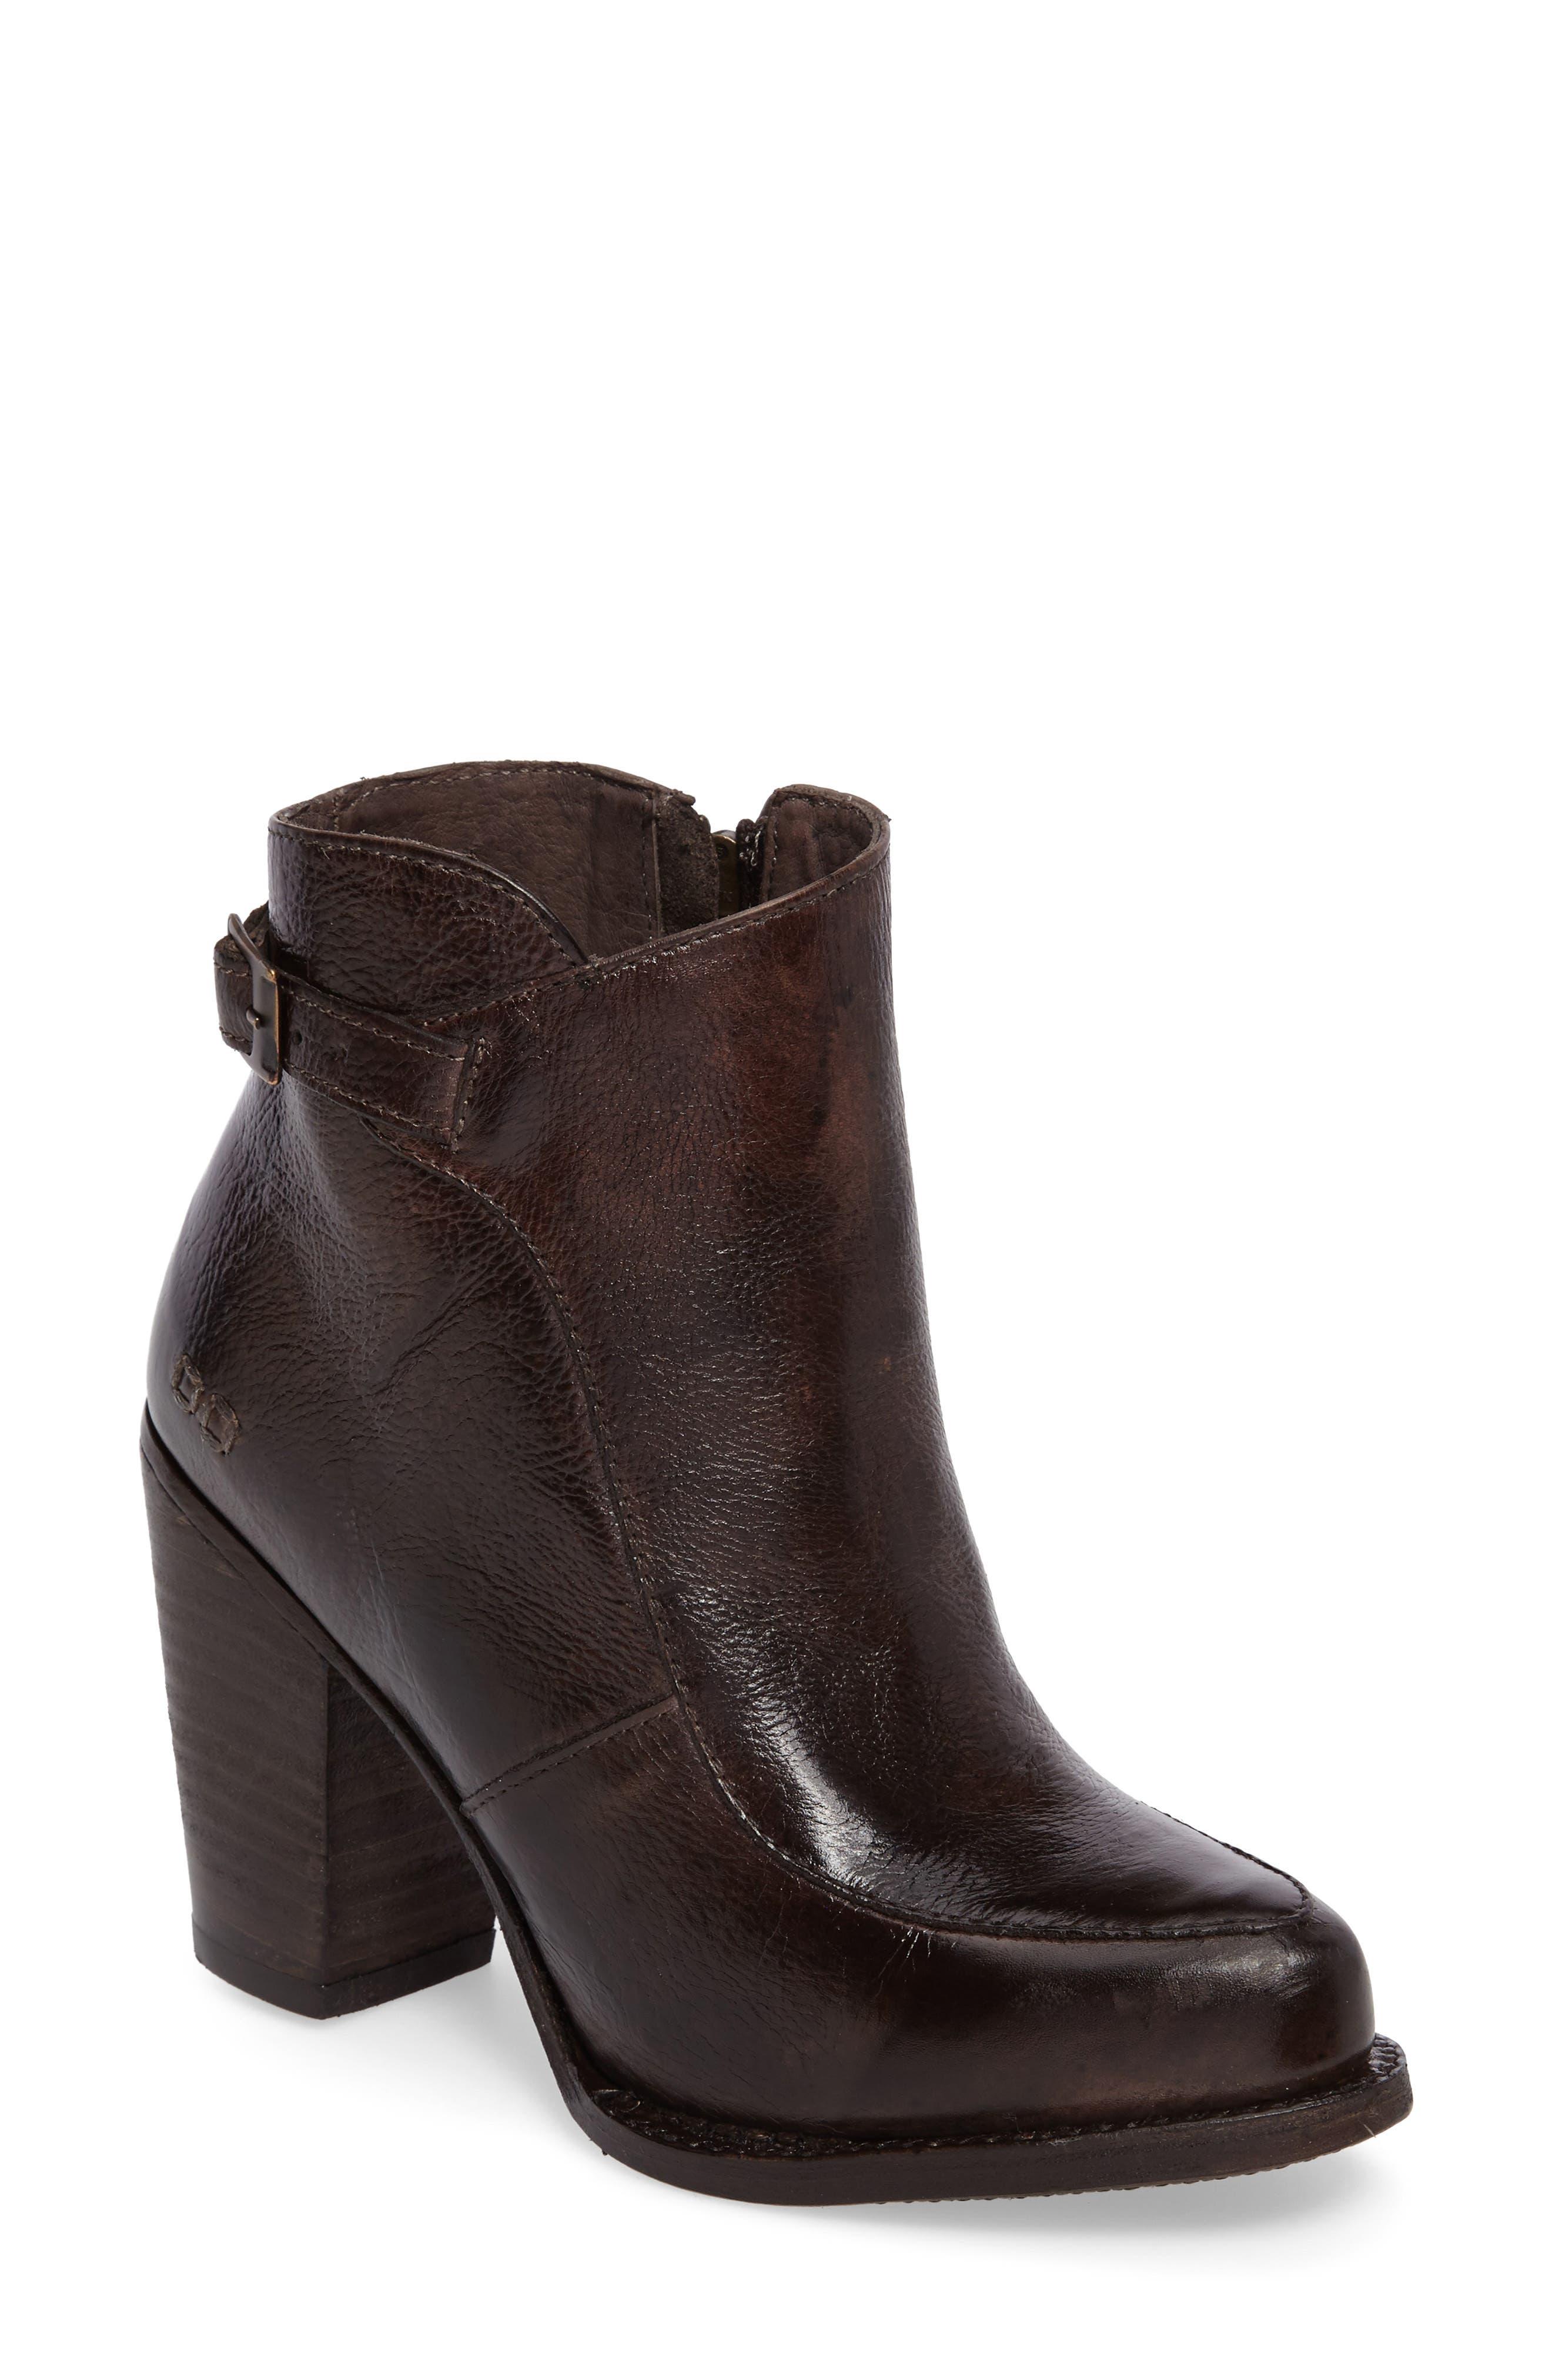 Alternate Image 1 Selected - Bed Stu 'Isla' Stacked Heel Boot (Women)